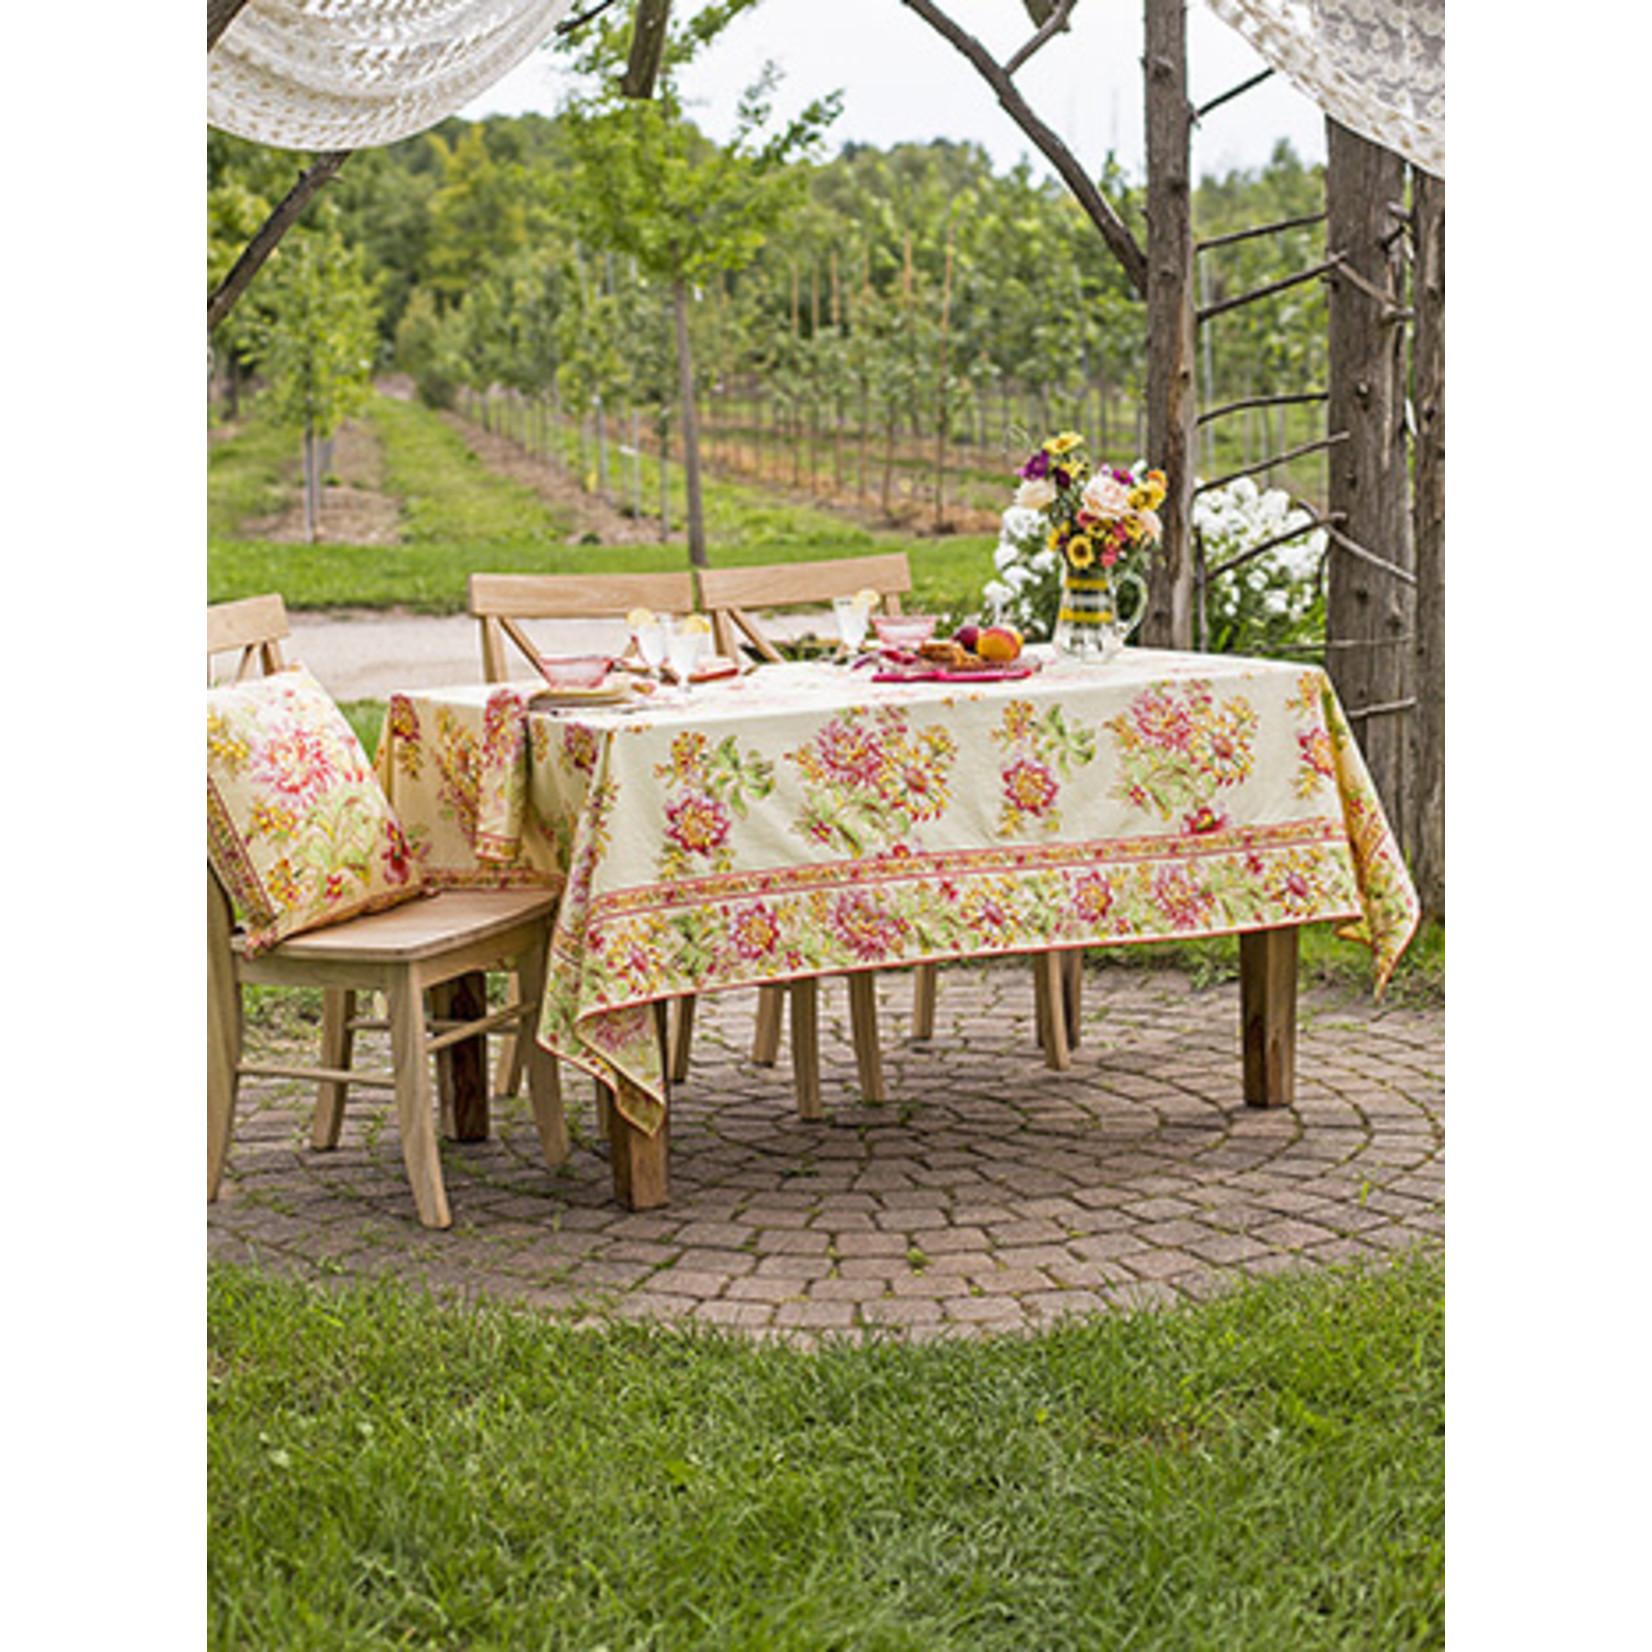 April Cornell Dahlia Days 36x36 Tablecloth